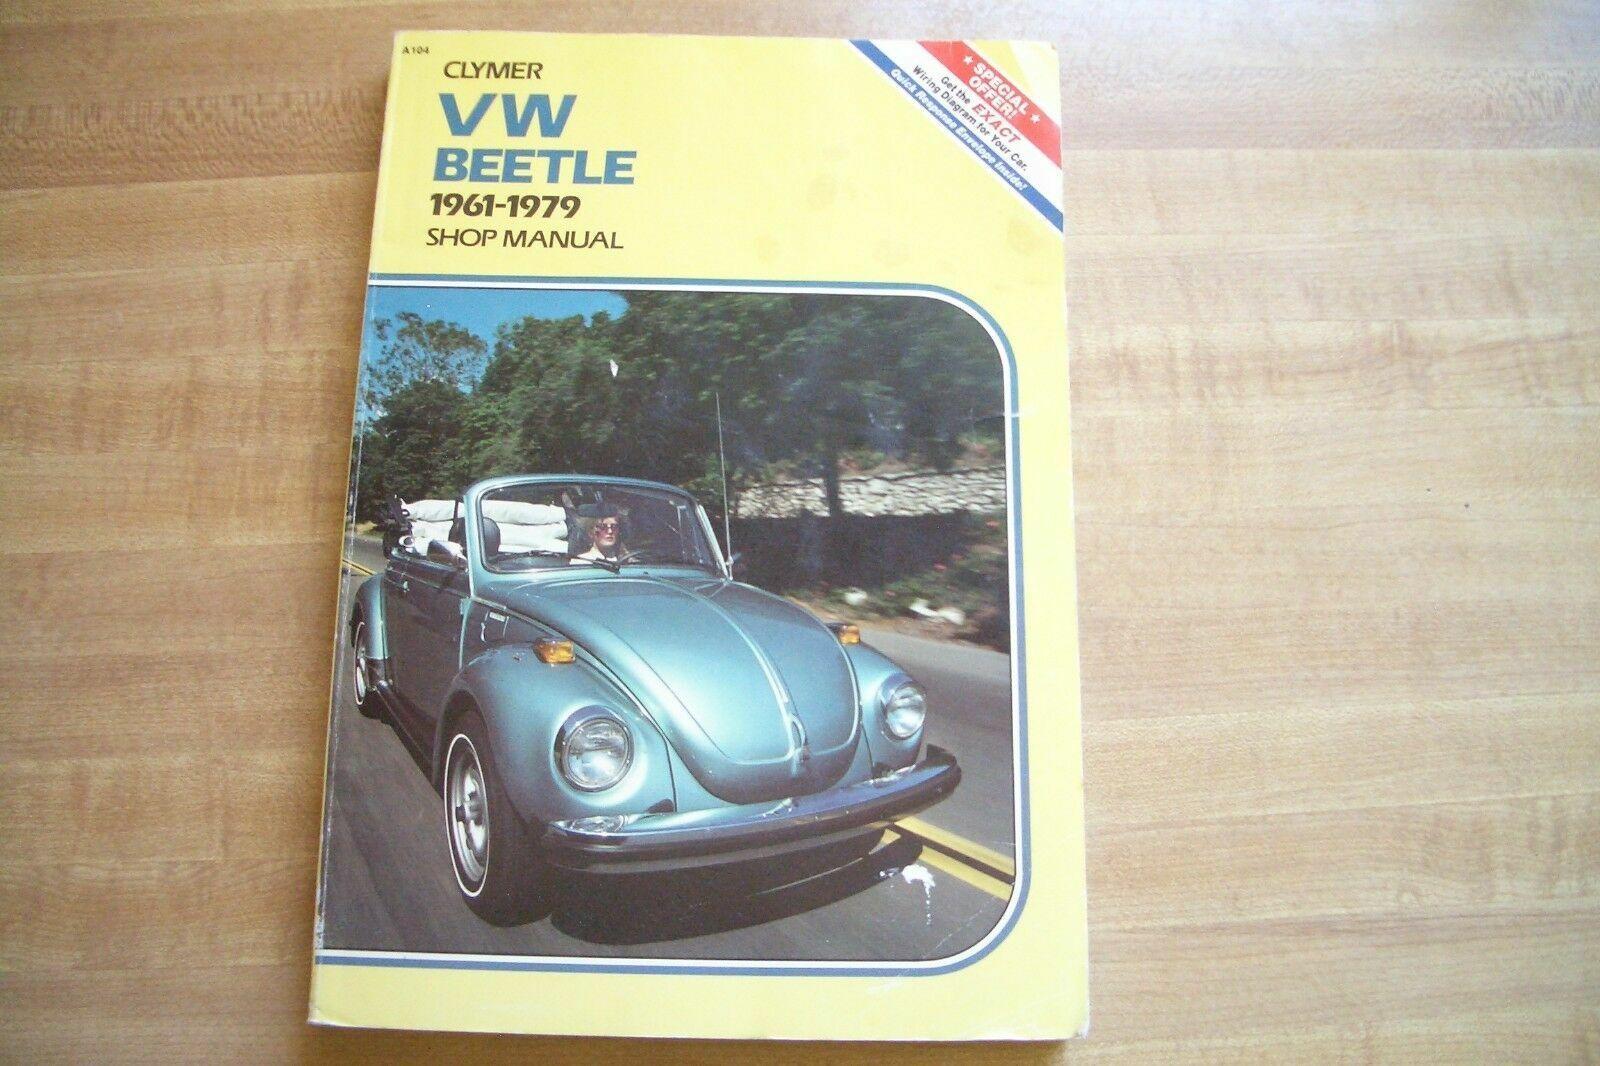 Volkswagen VW Beetle /& Ghia 1961-1979 Clymer Shop Service Manual USED